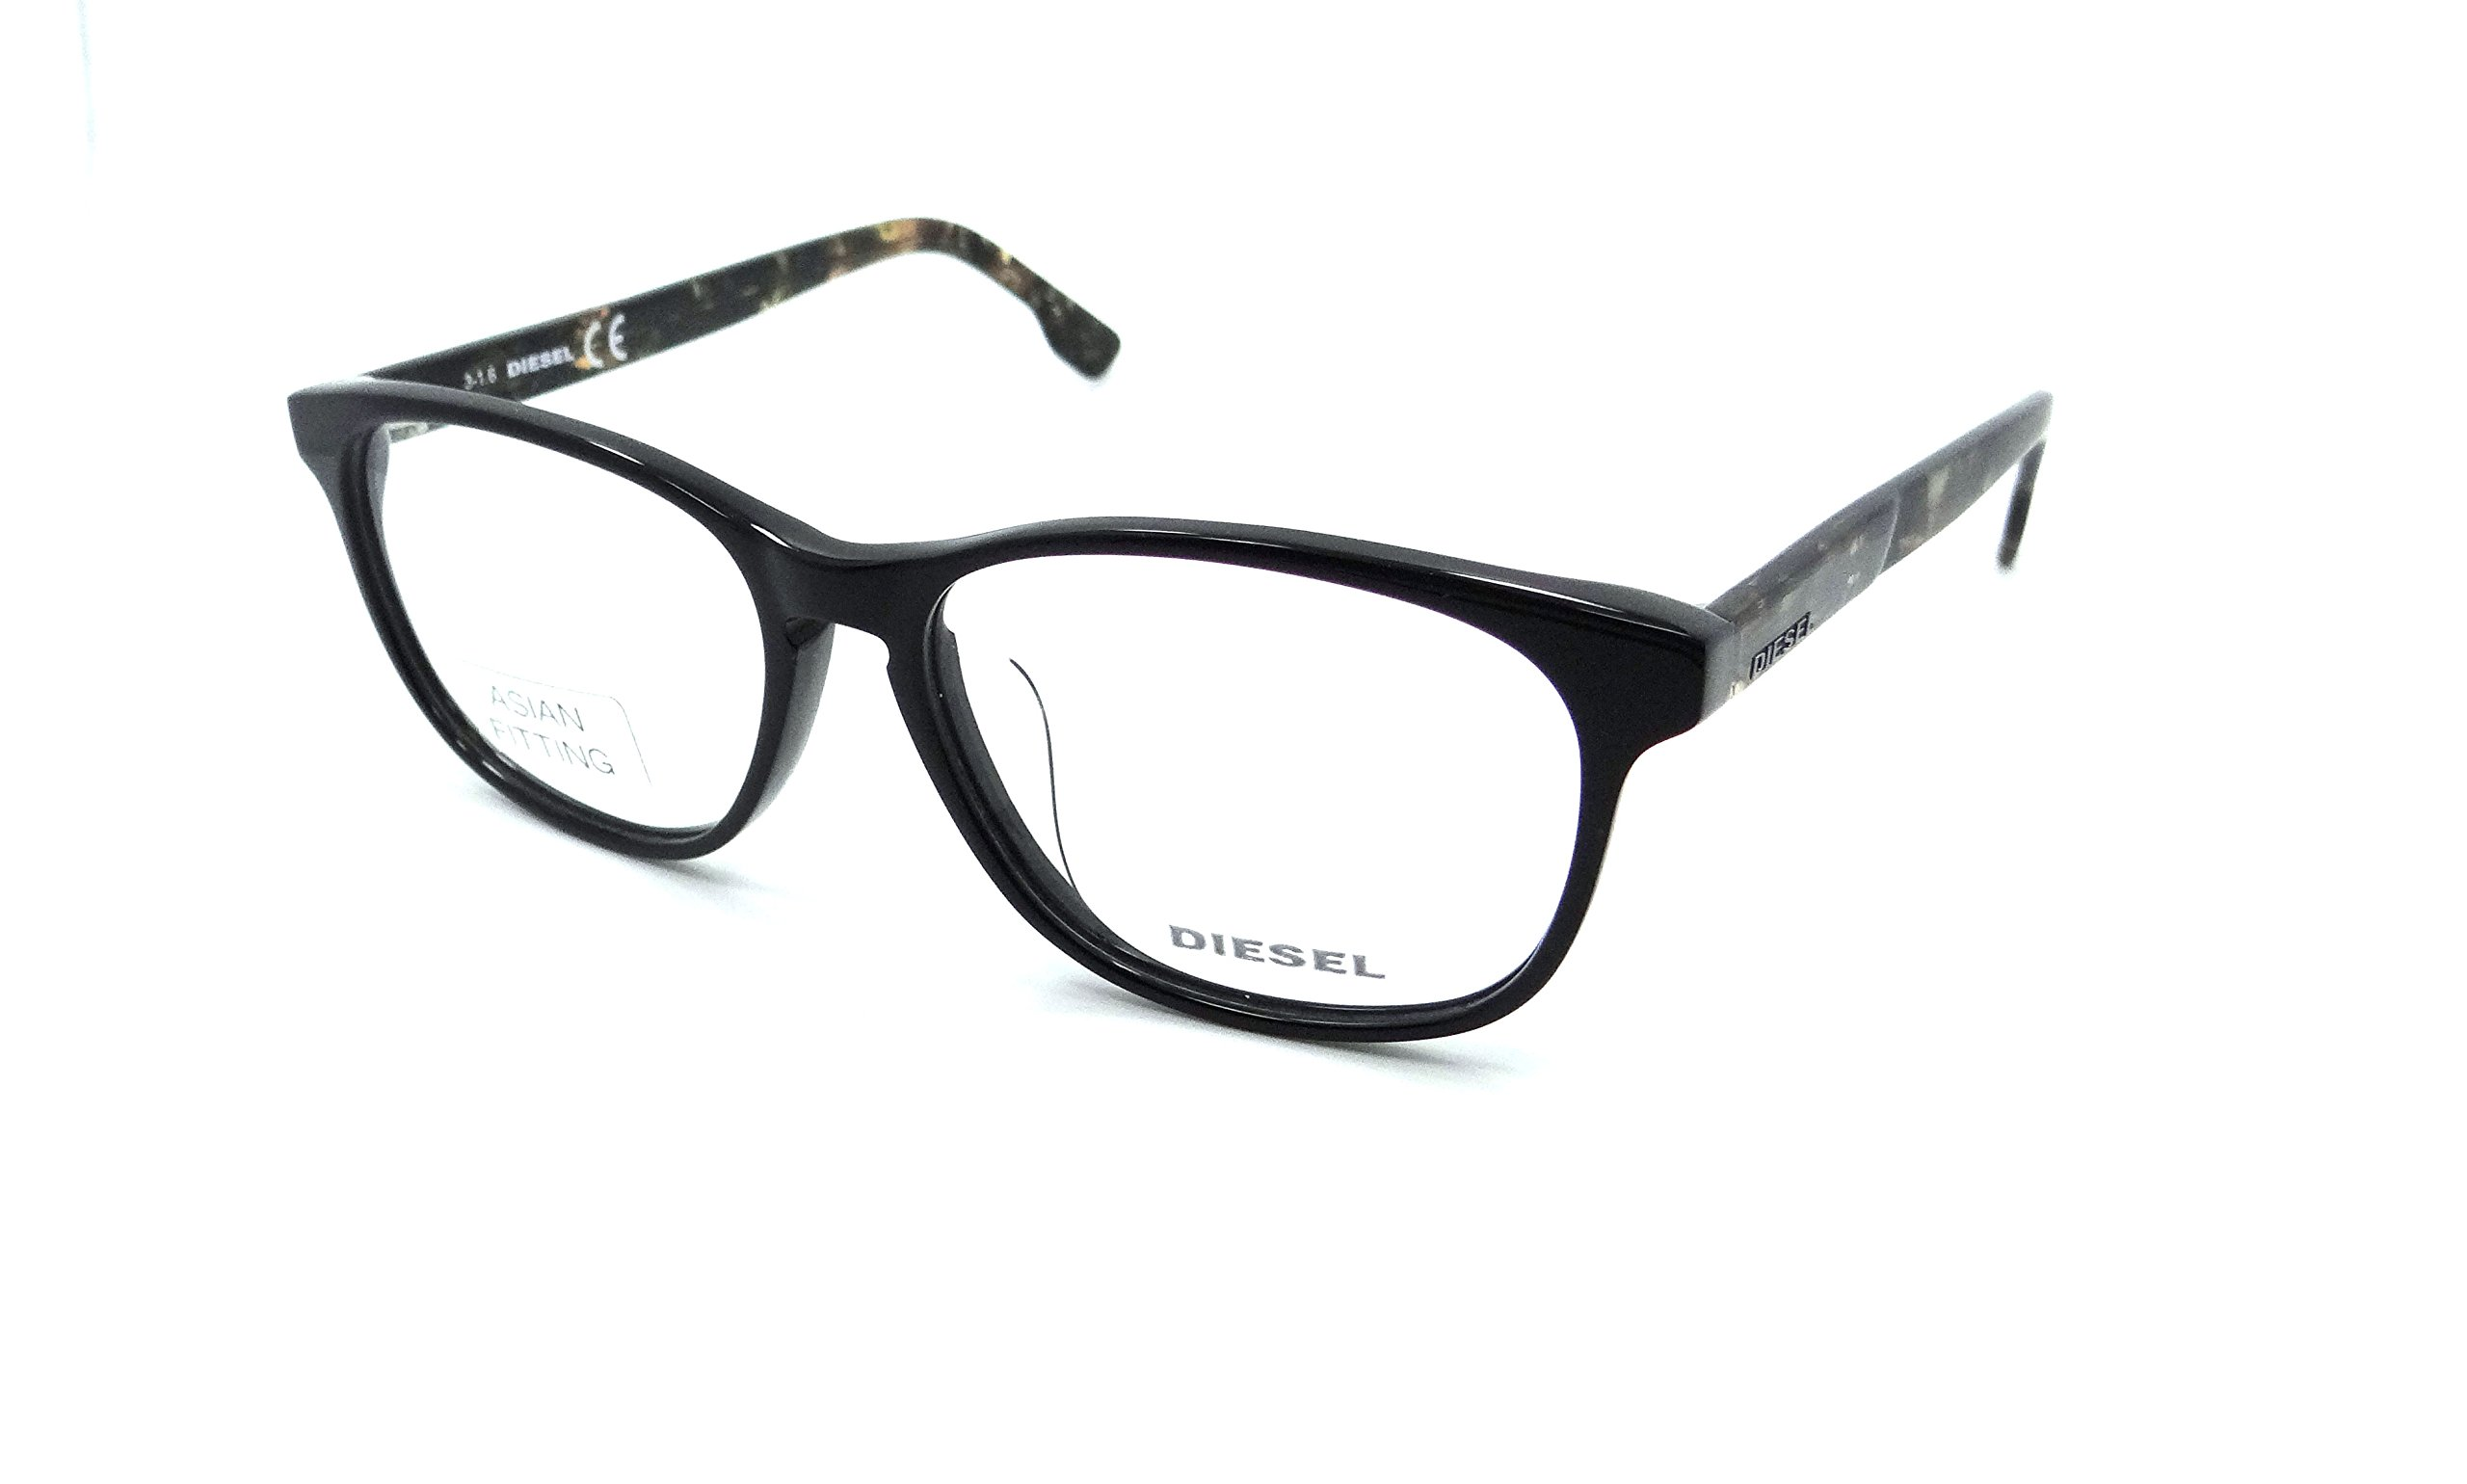 New Authentic Diesel Rx Eyeglasses Frames DL5187-F 001 55-15-145 Shiny Black /Havana Asian Fit